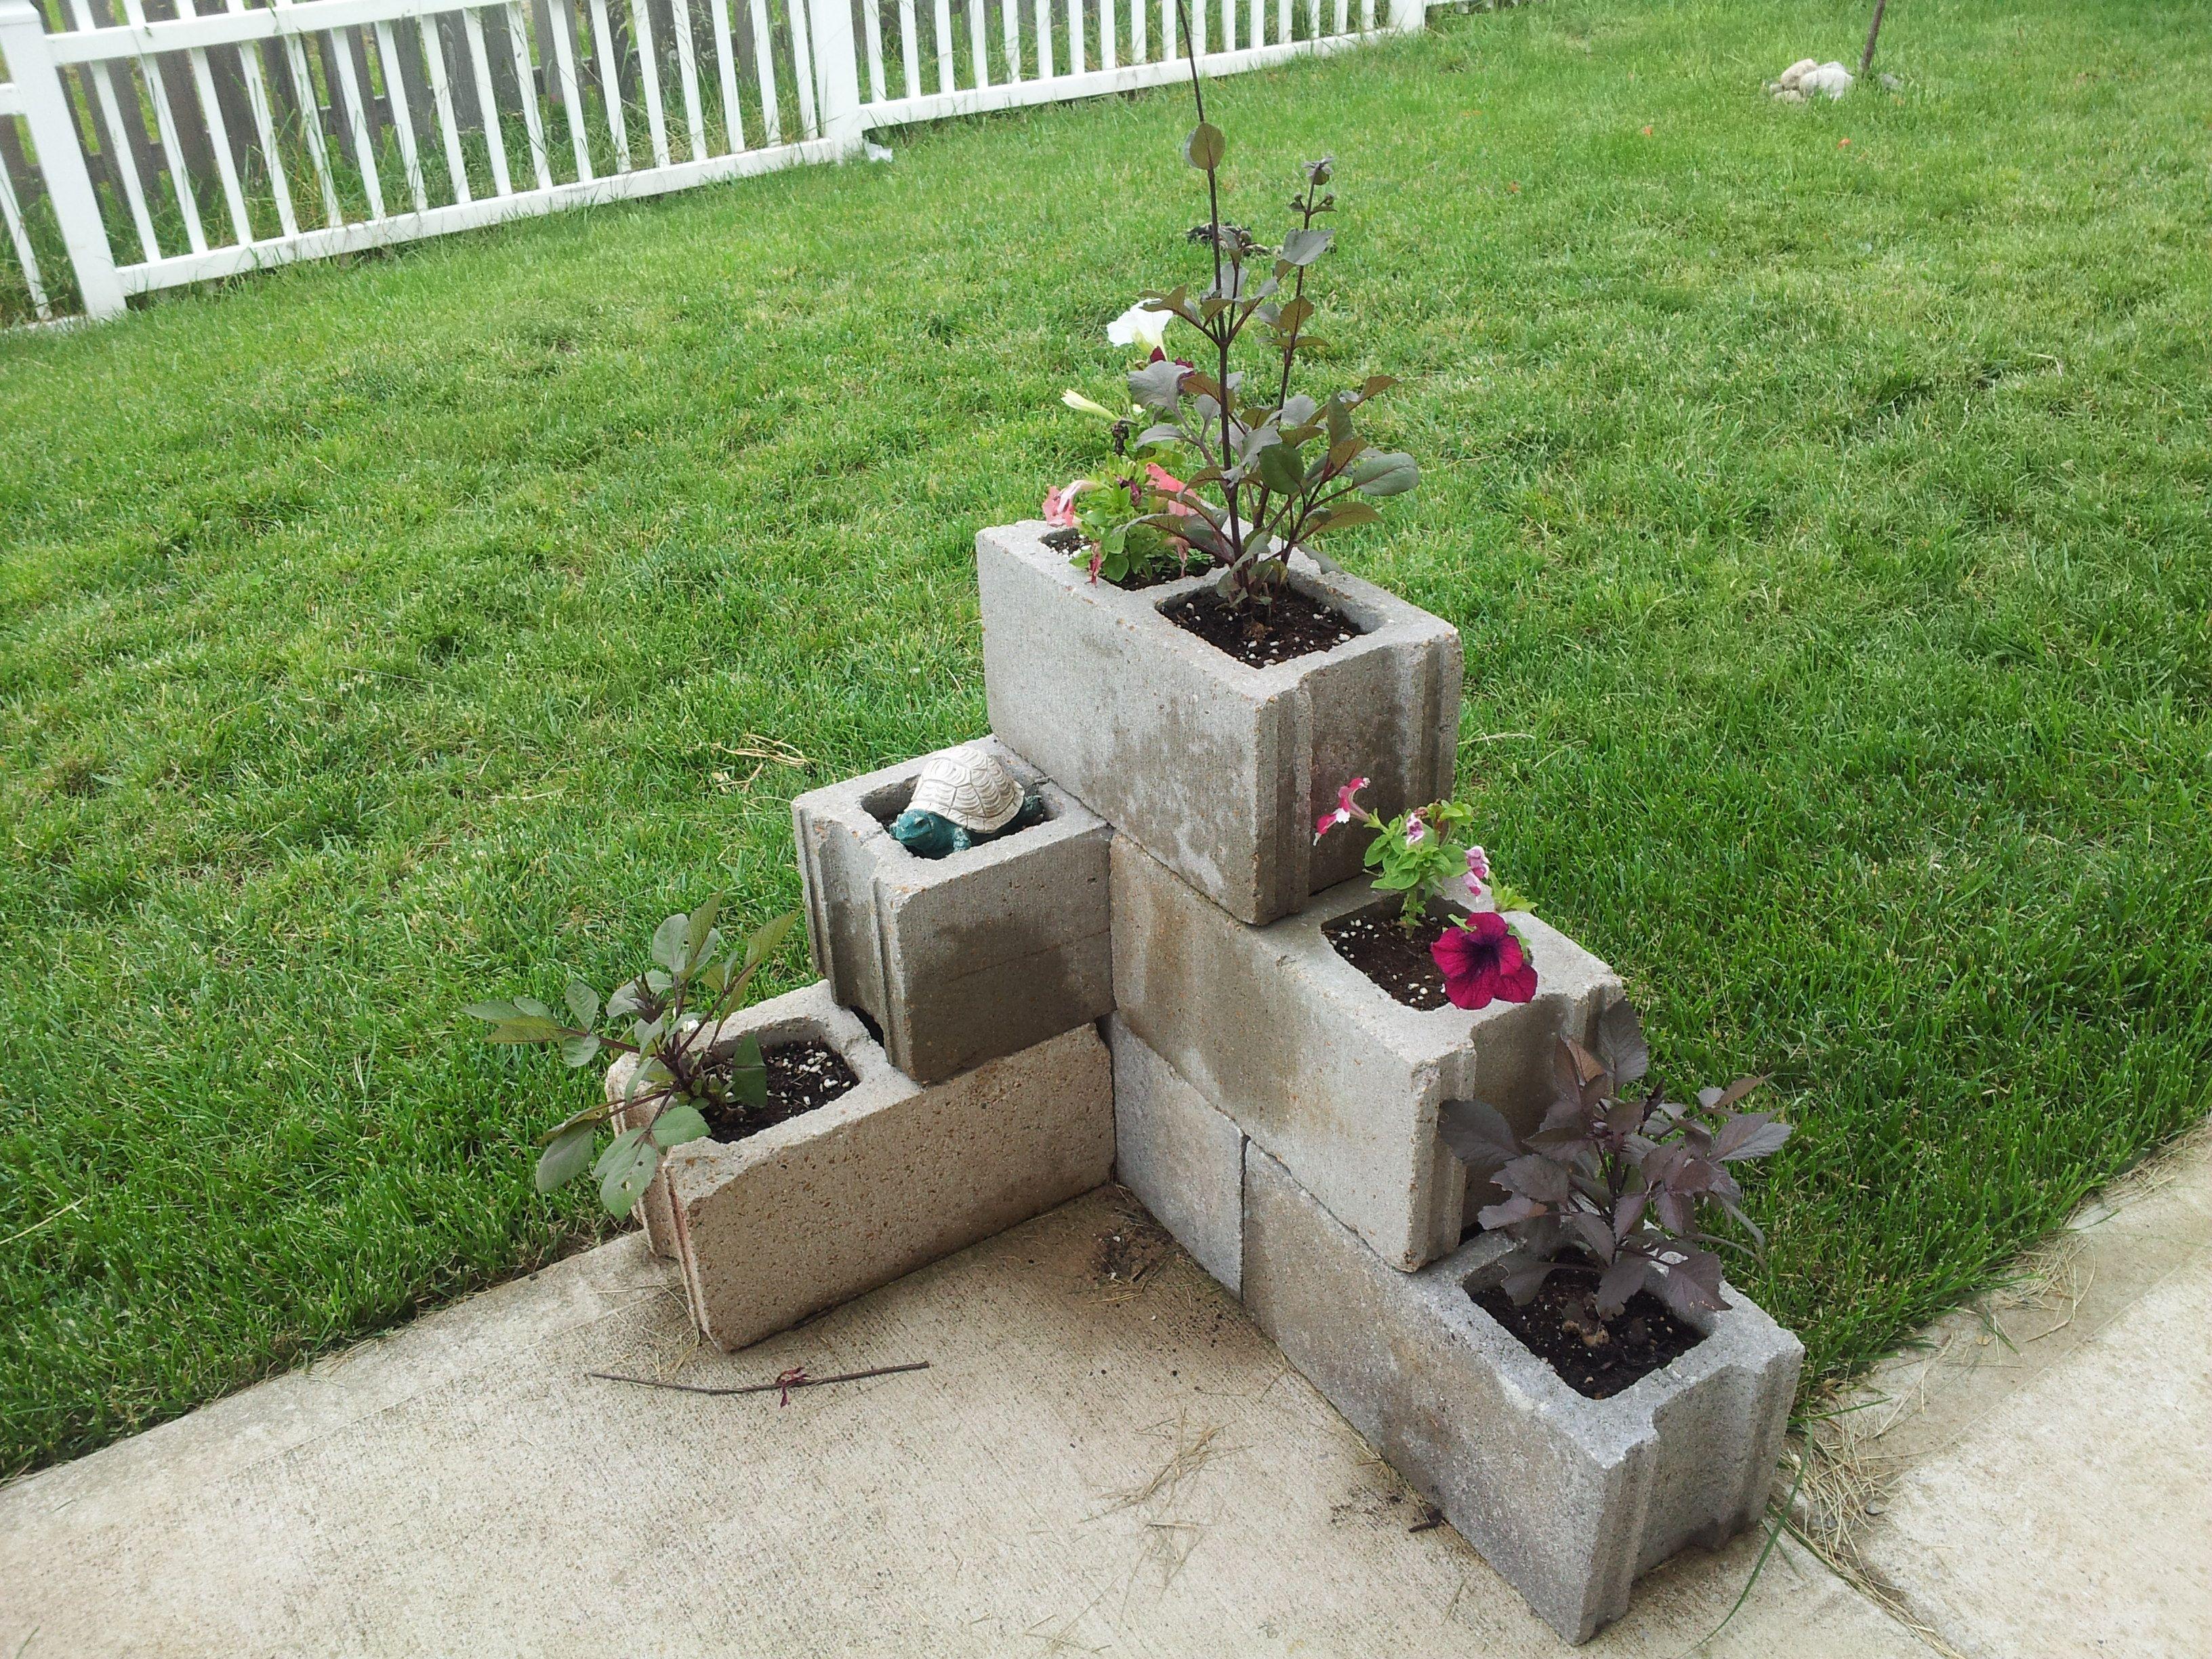 Cinder block garden   garden/yard   Pinterest   Cinder block garden